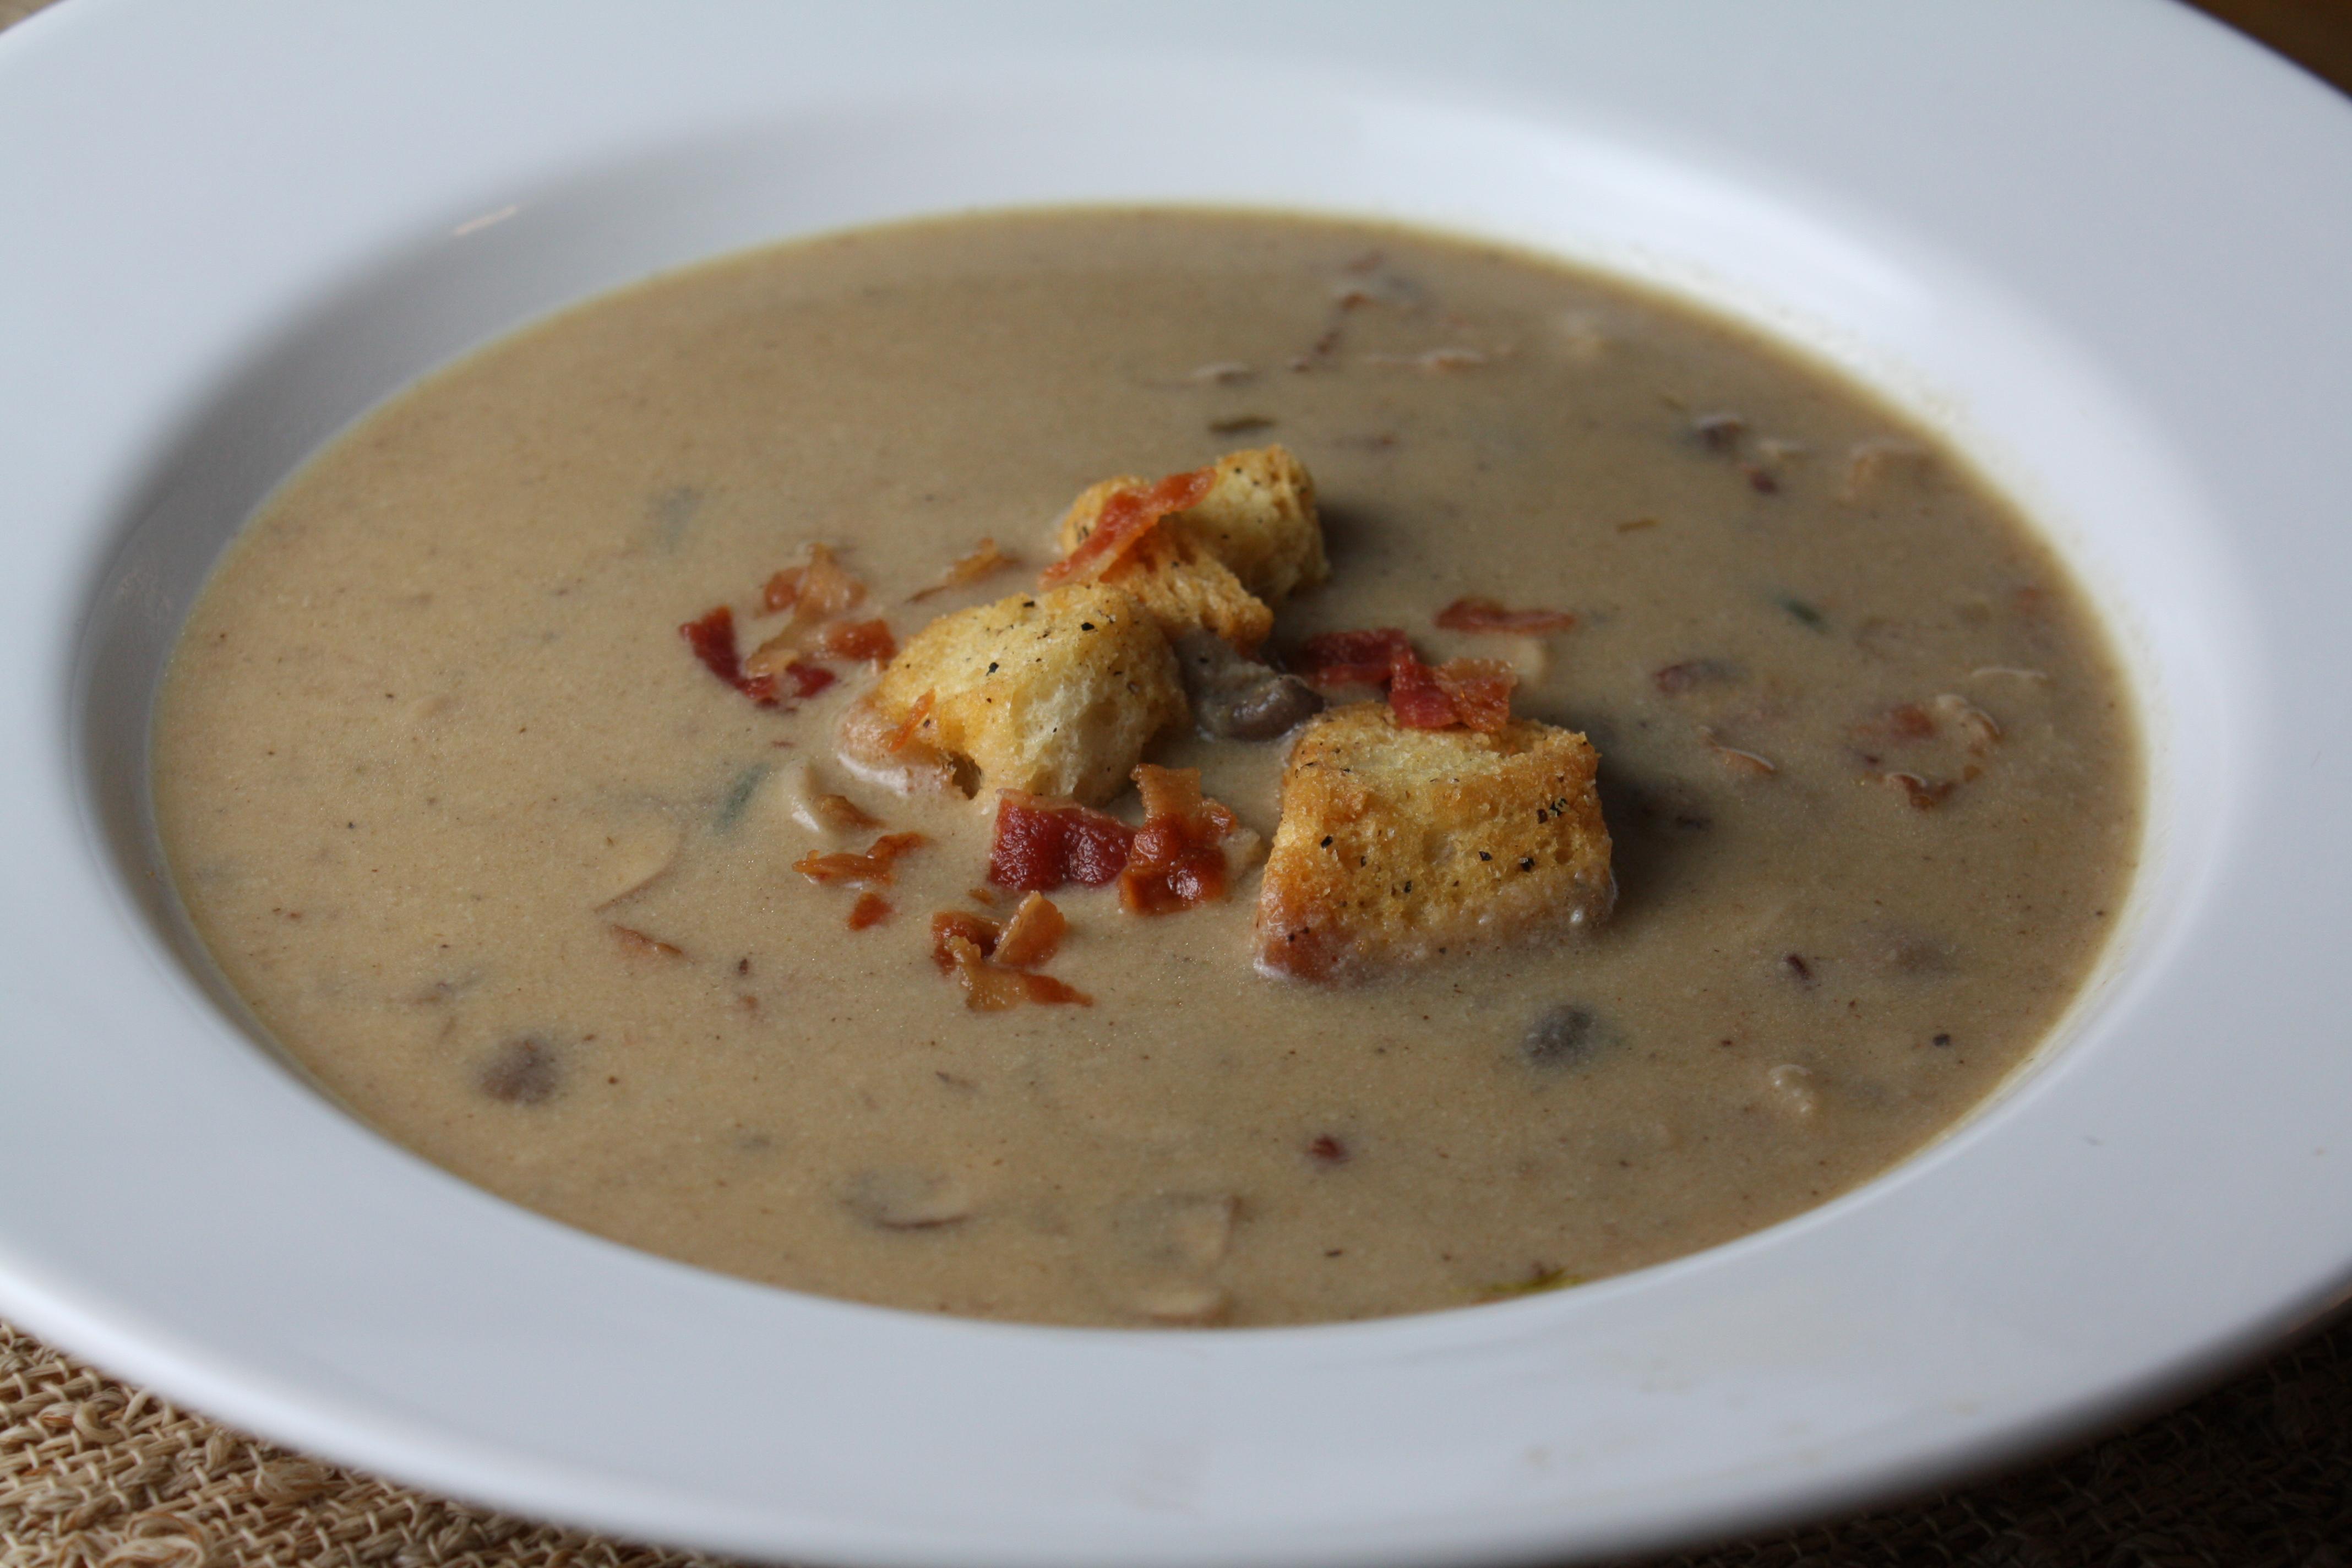 soup cream of mushroom soup the real mushroom soup porcini mushroom ...